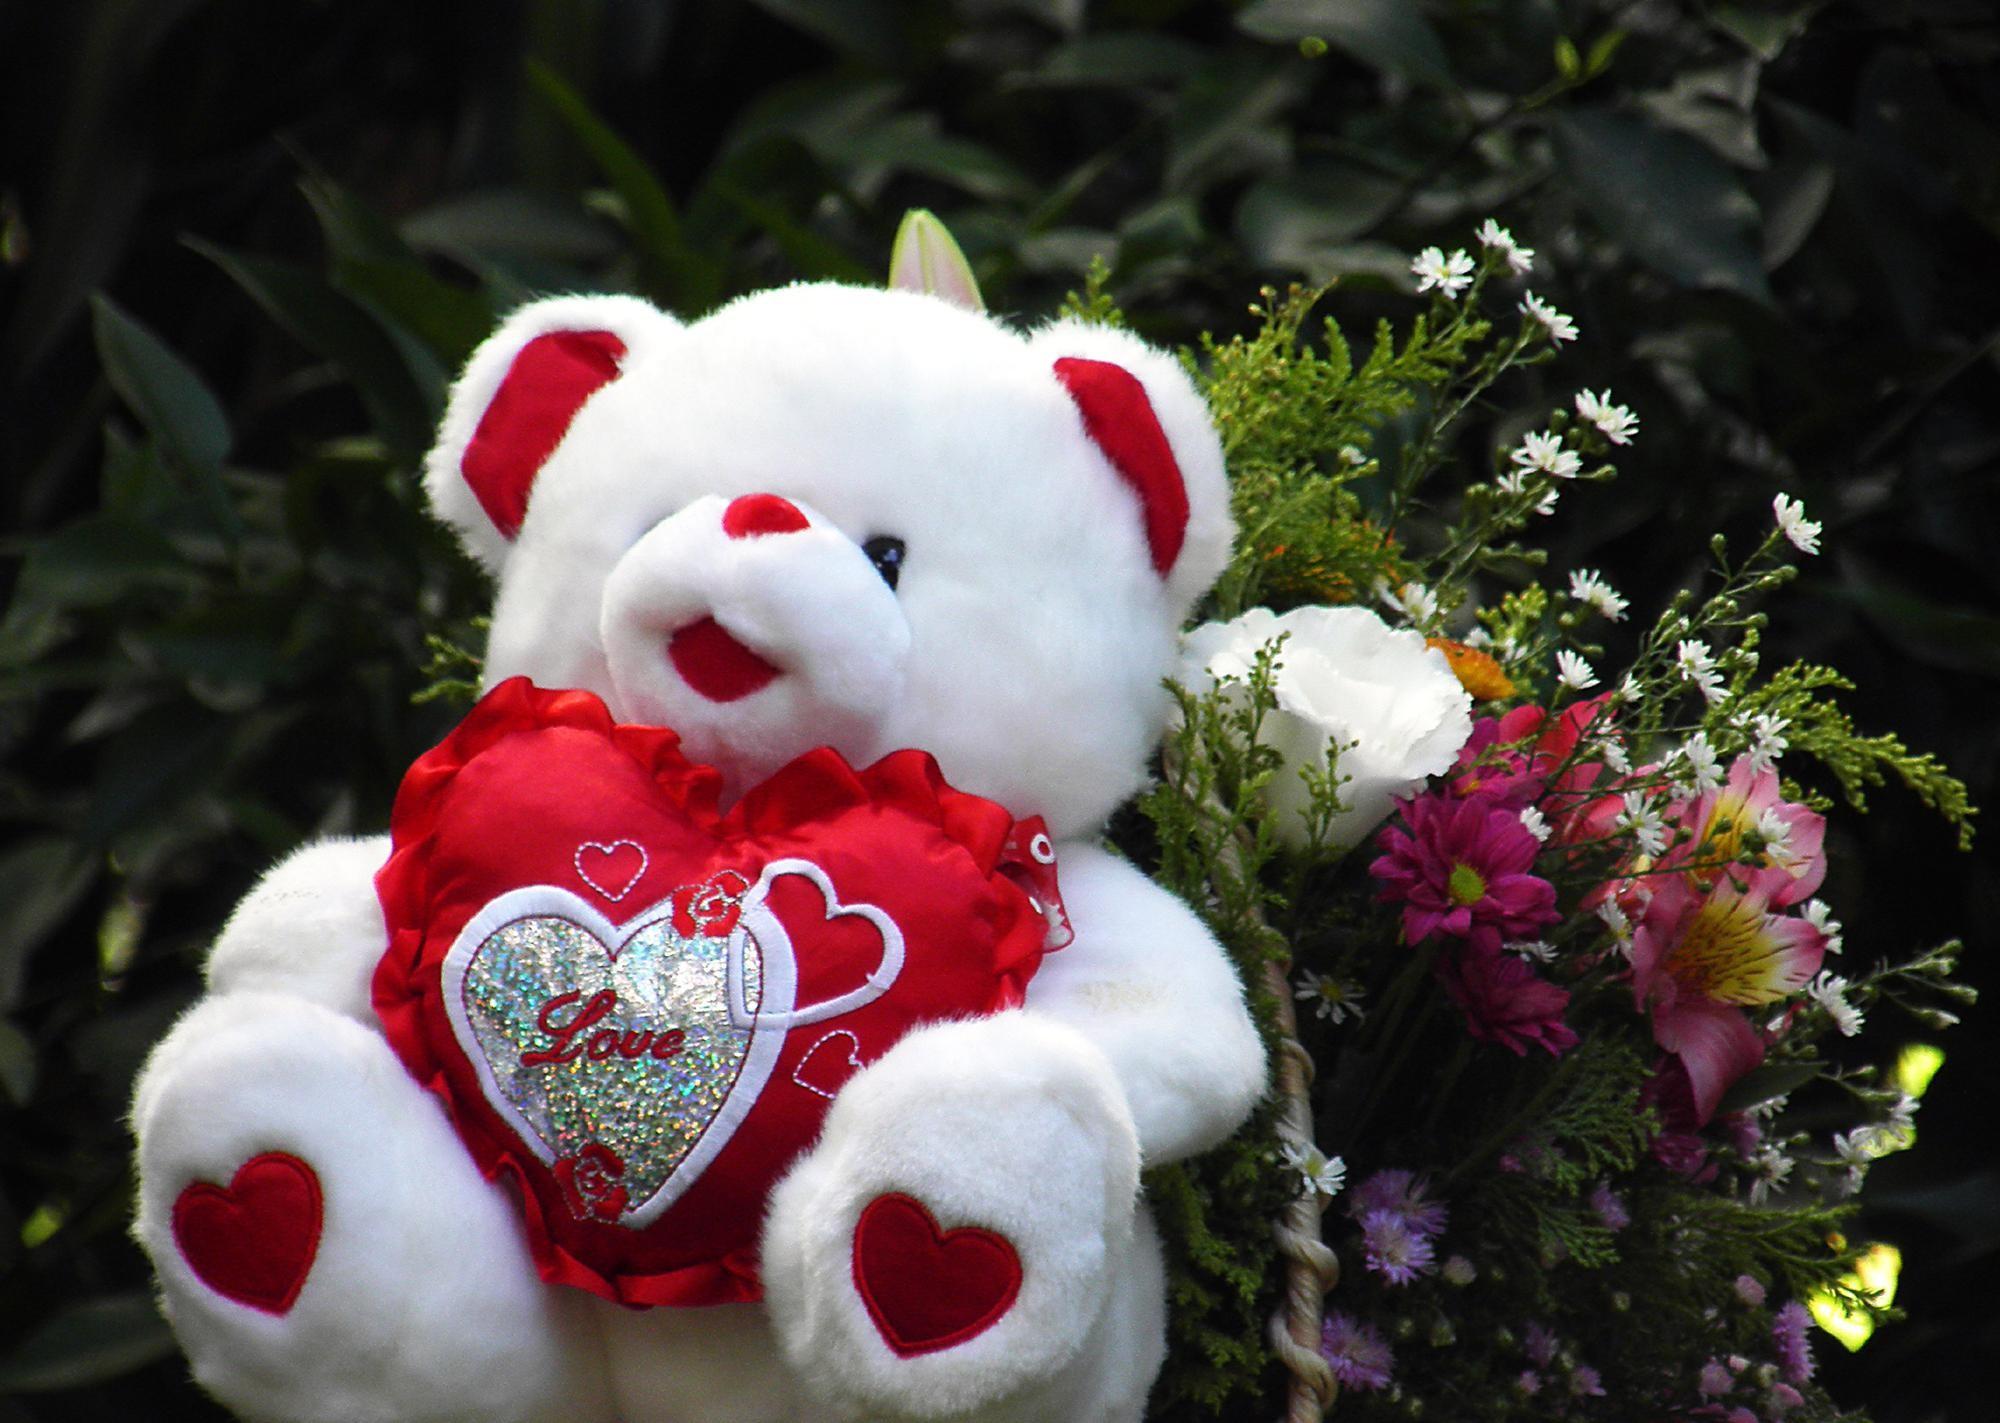 Cute Little Love Couple Hd Wallpaper Cute Teddy Bear Wallpapers 183 ① Wallpapertag